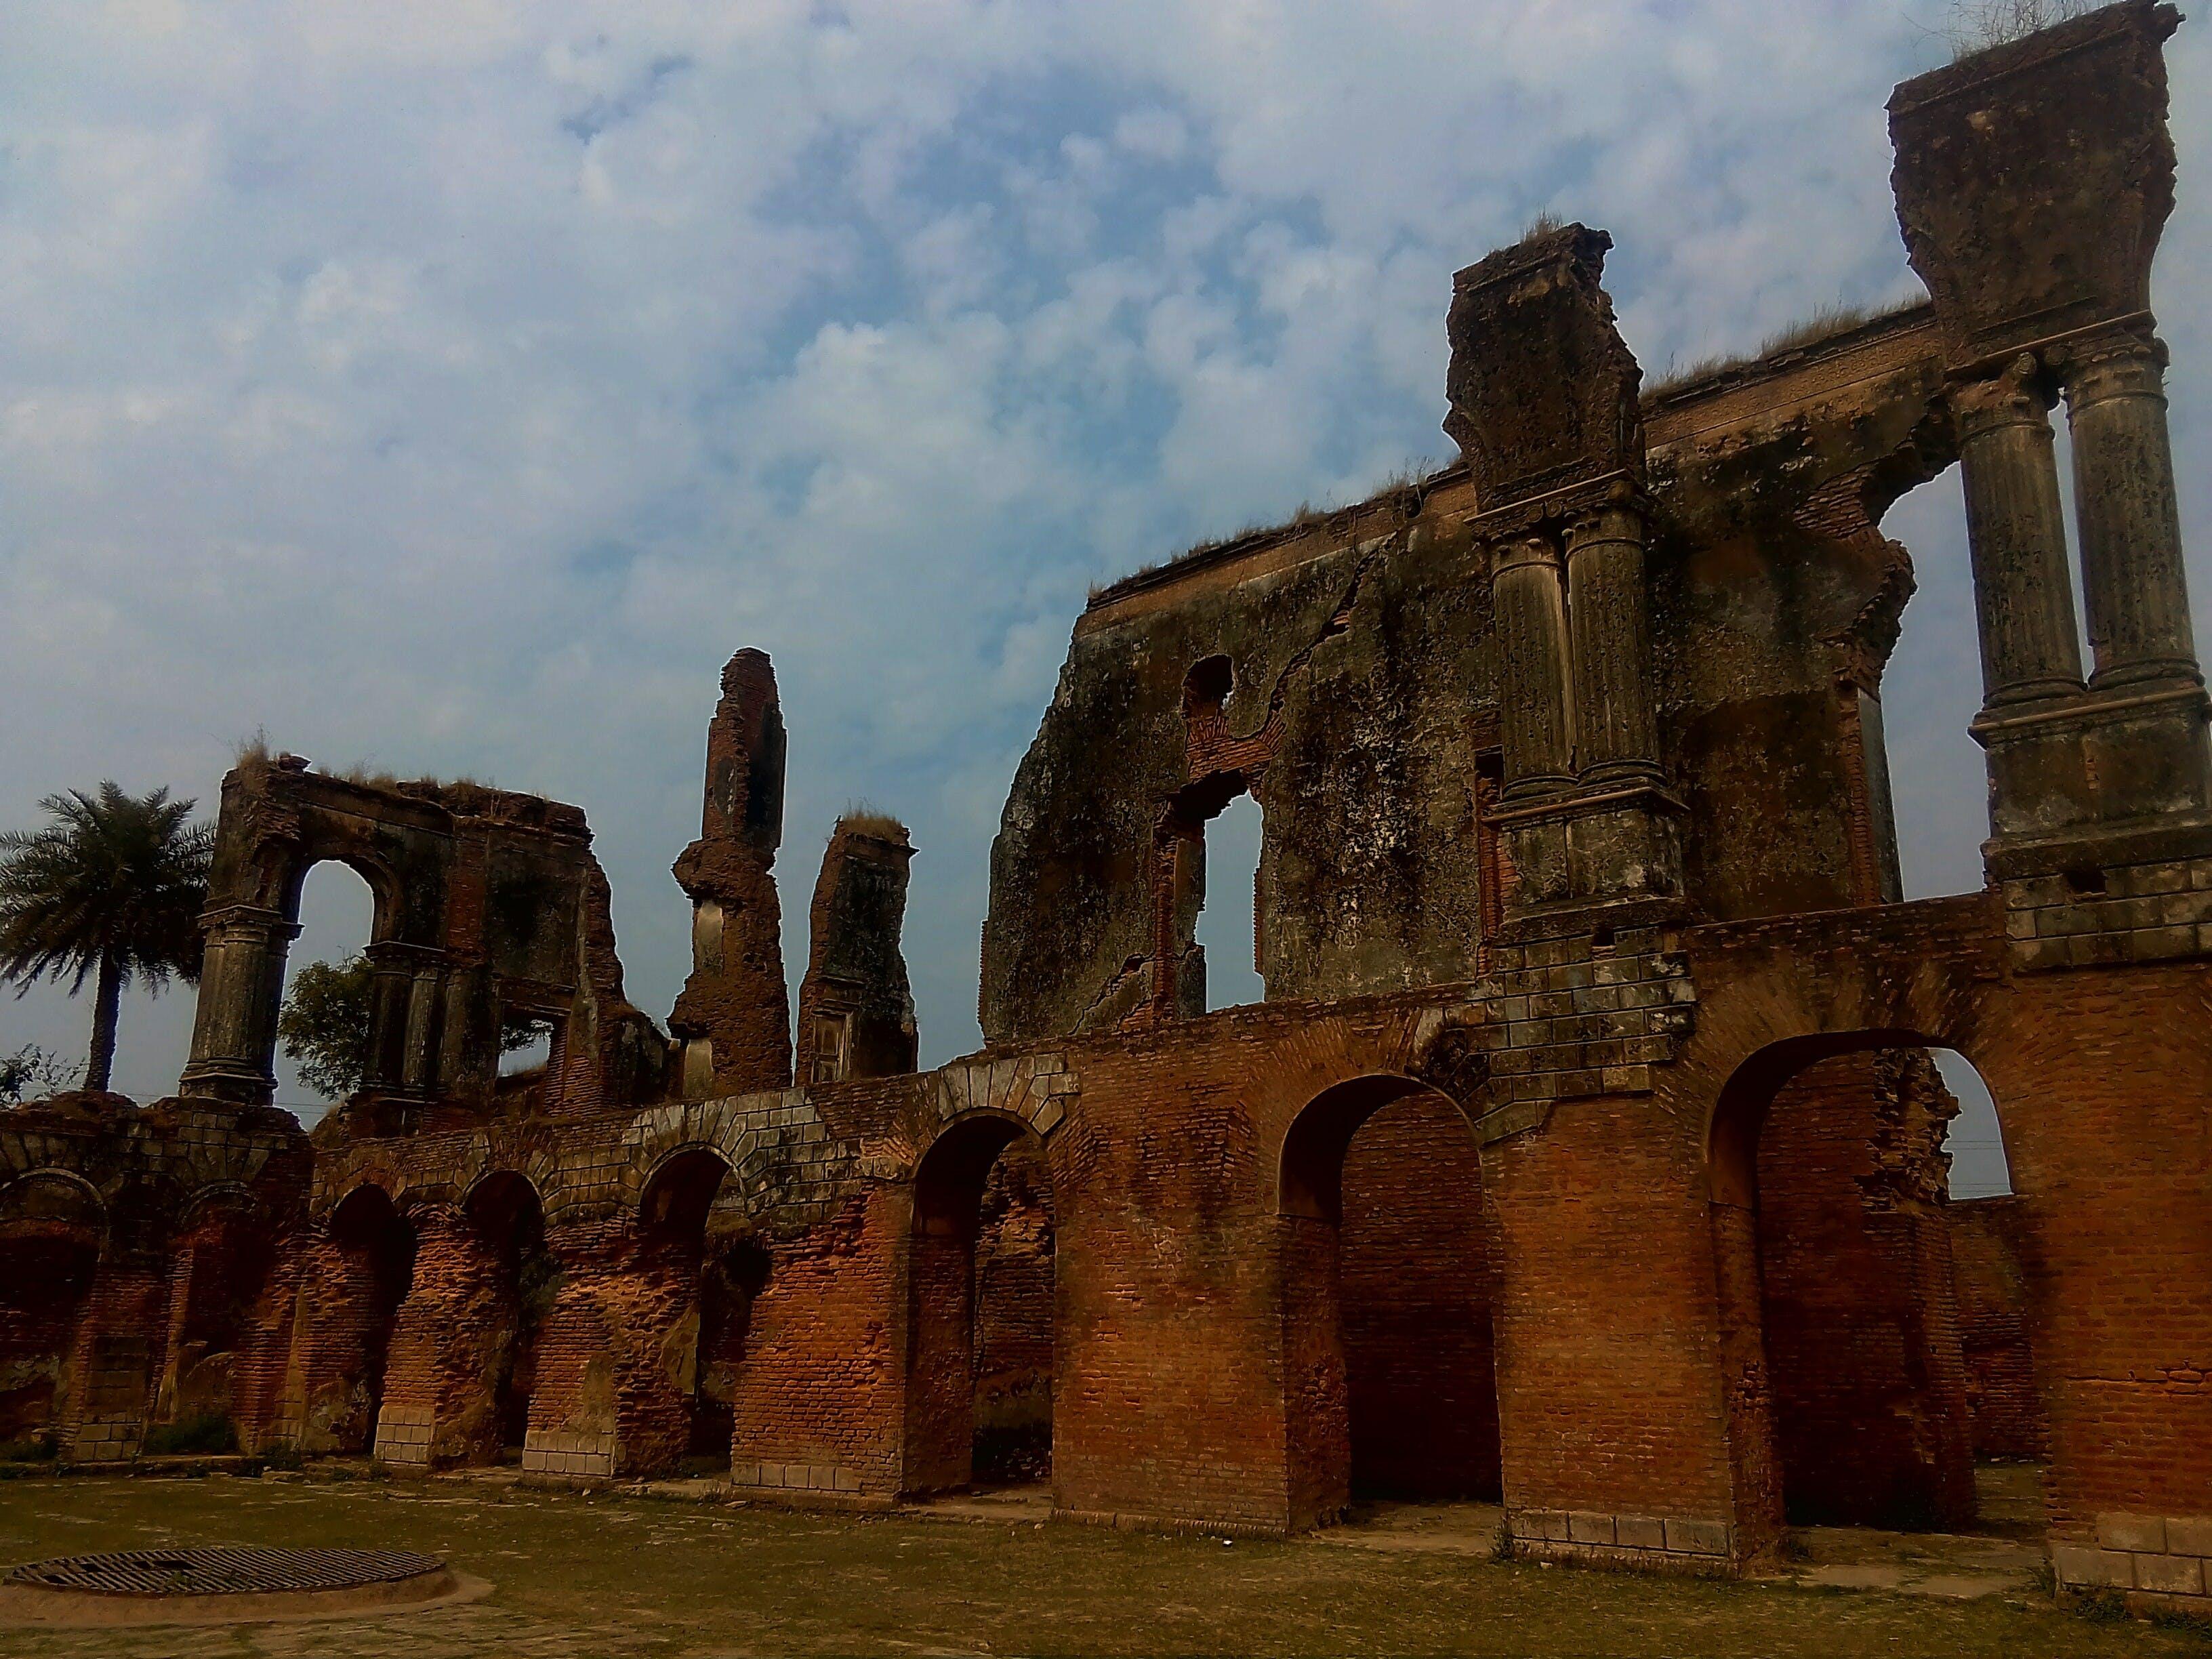 Gratis lagerfoto af antikviteter, arkitektoniske detaljer, arkitektur, arkæologi